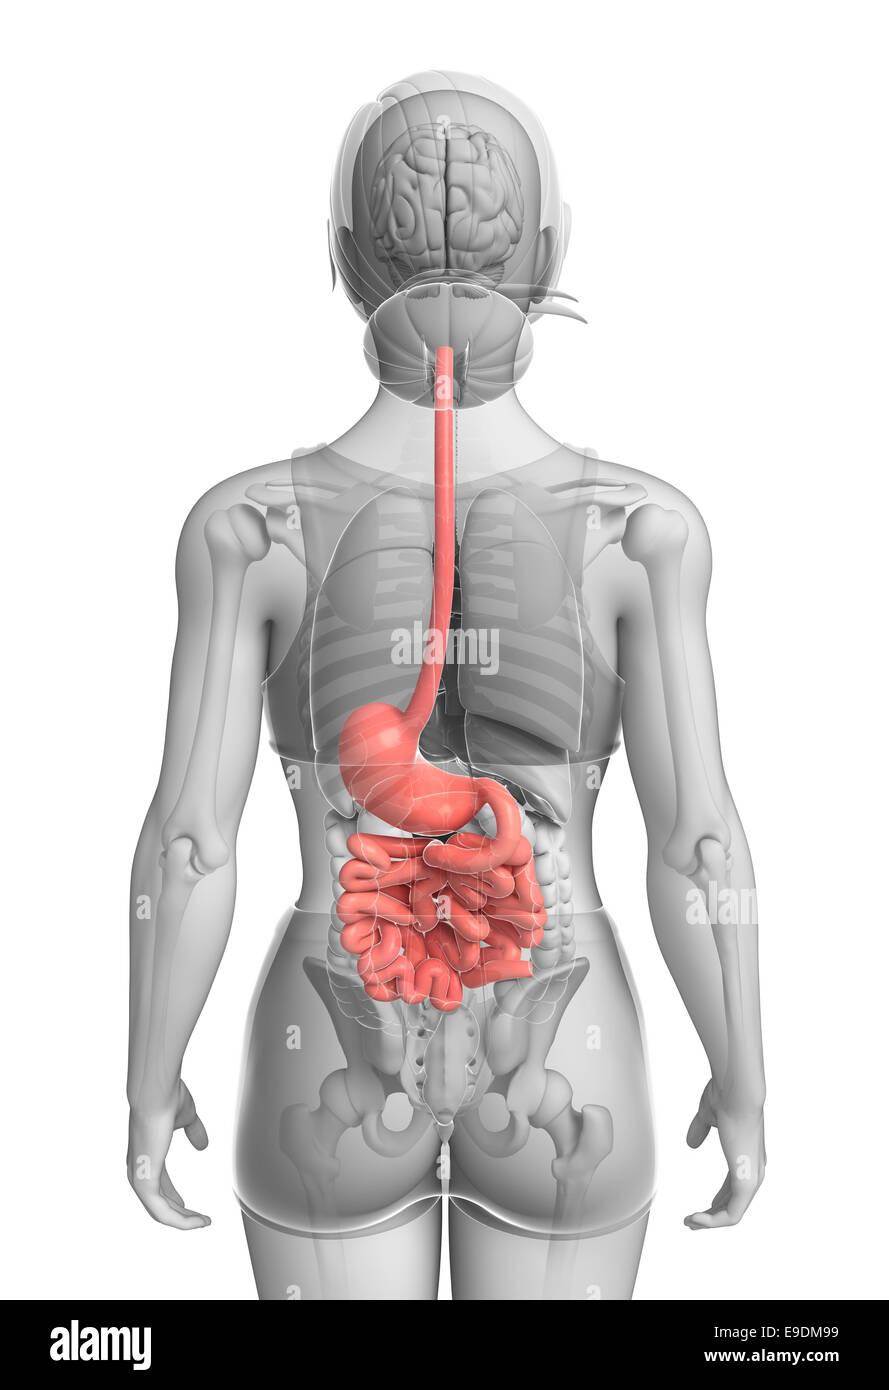 Female Small Intestine Stock Photos & Female Small Intestine Stock ...